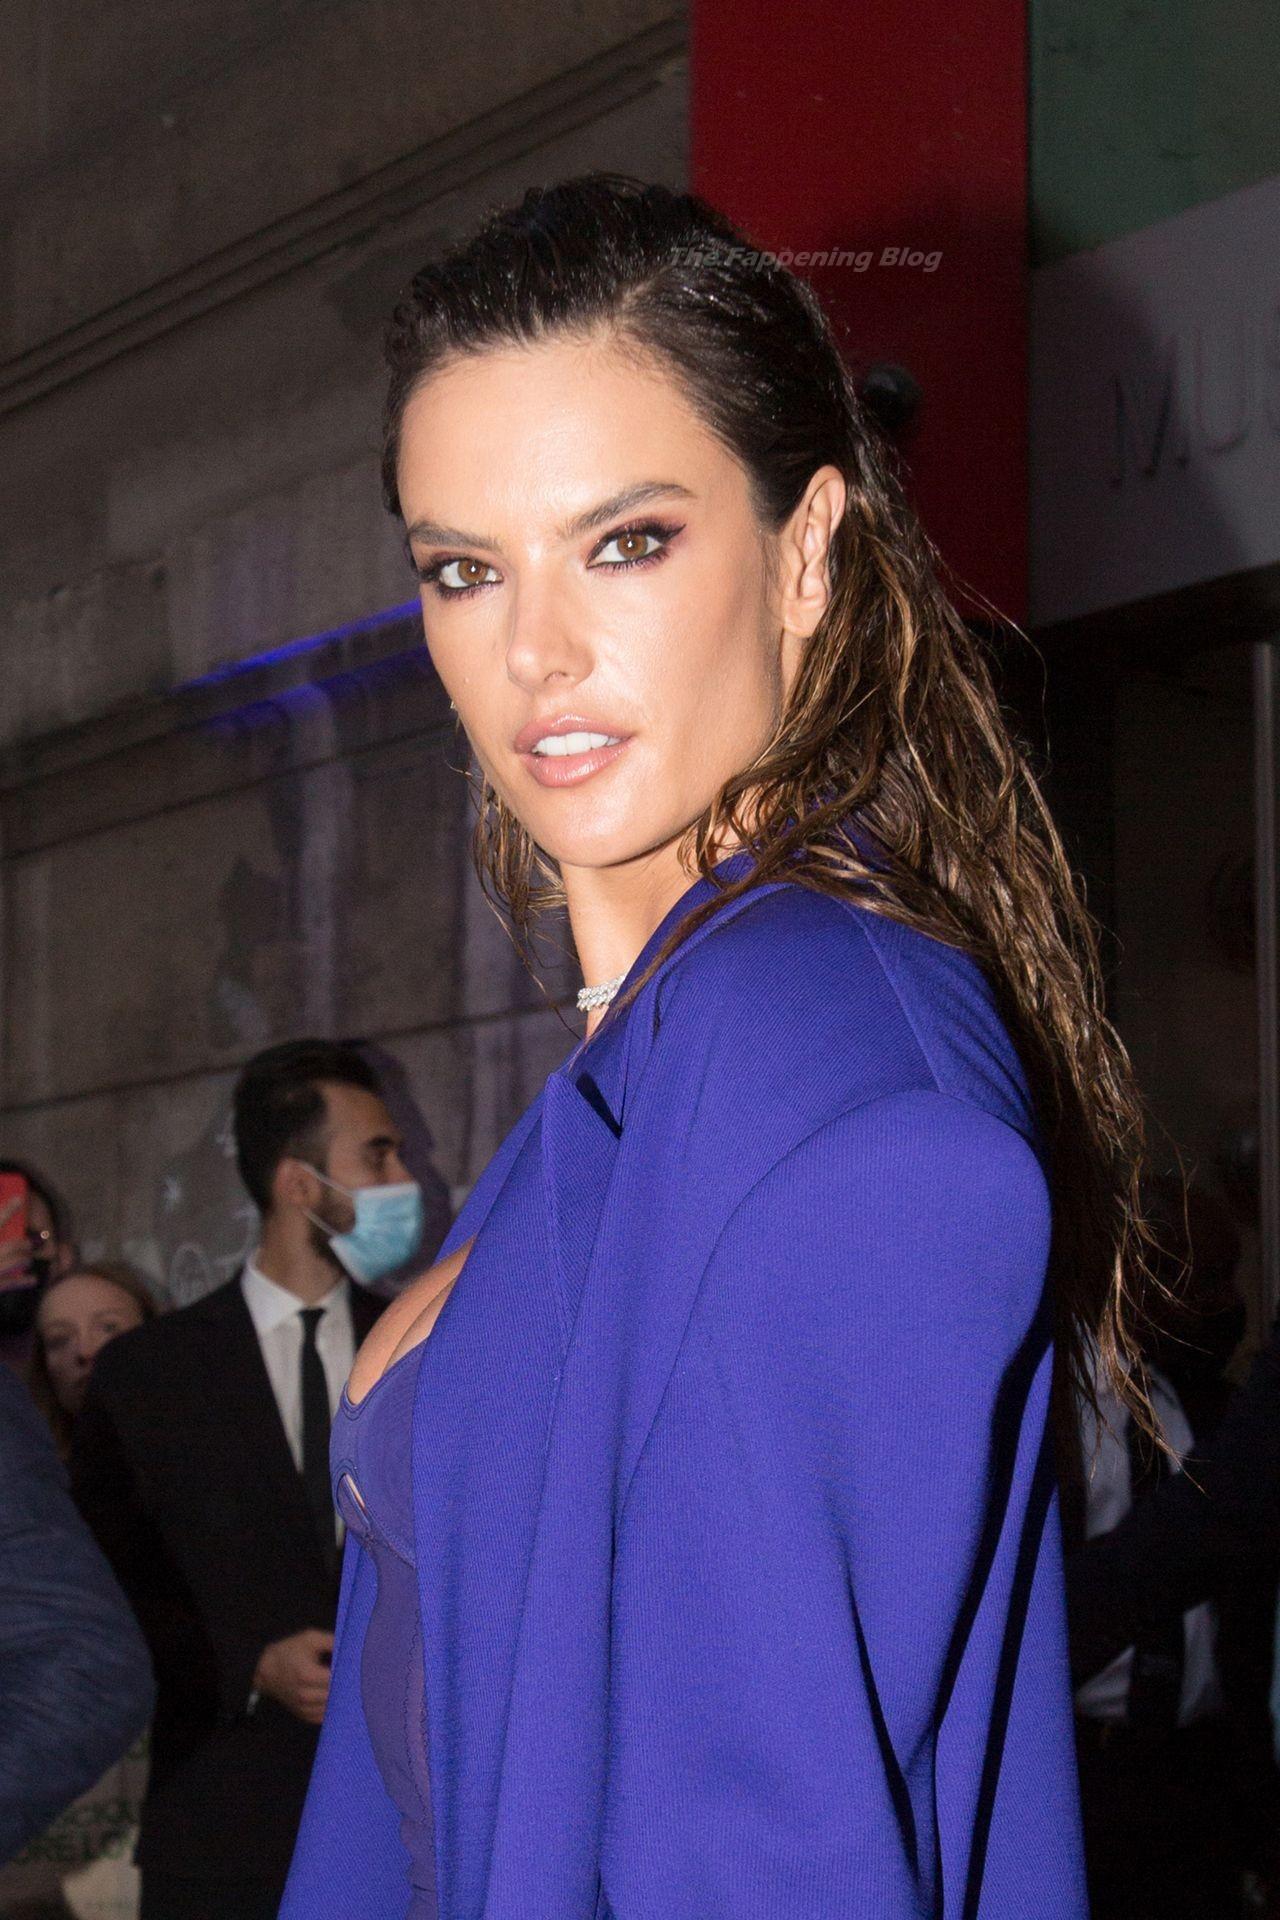 Alessandra-Ambrosio-Sexy-The-Fappening-Blog-13-3.jpg